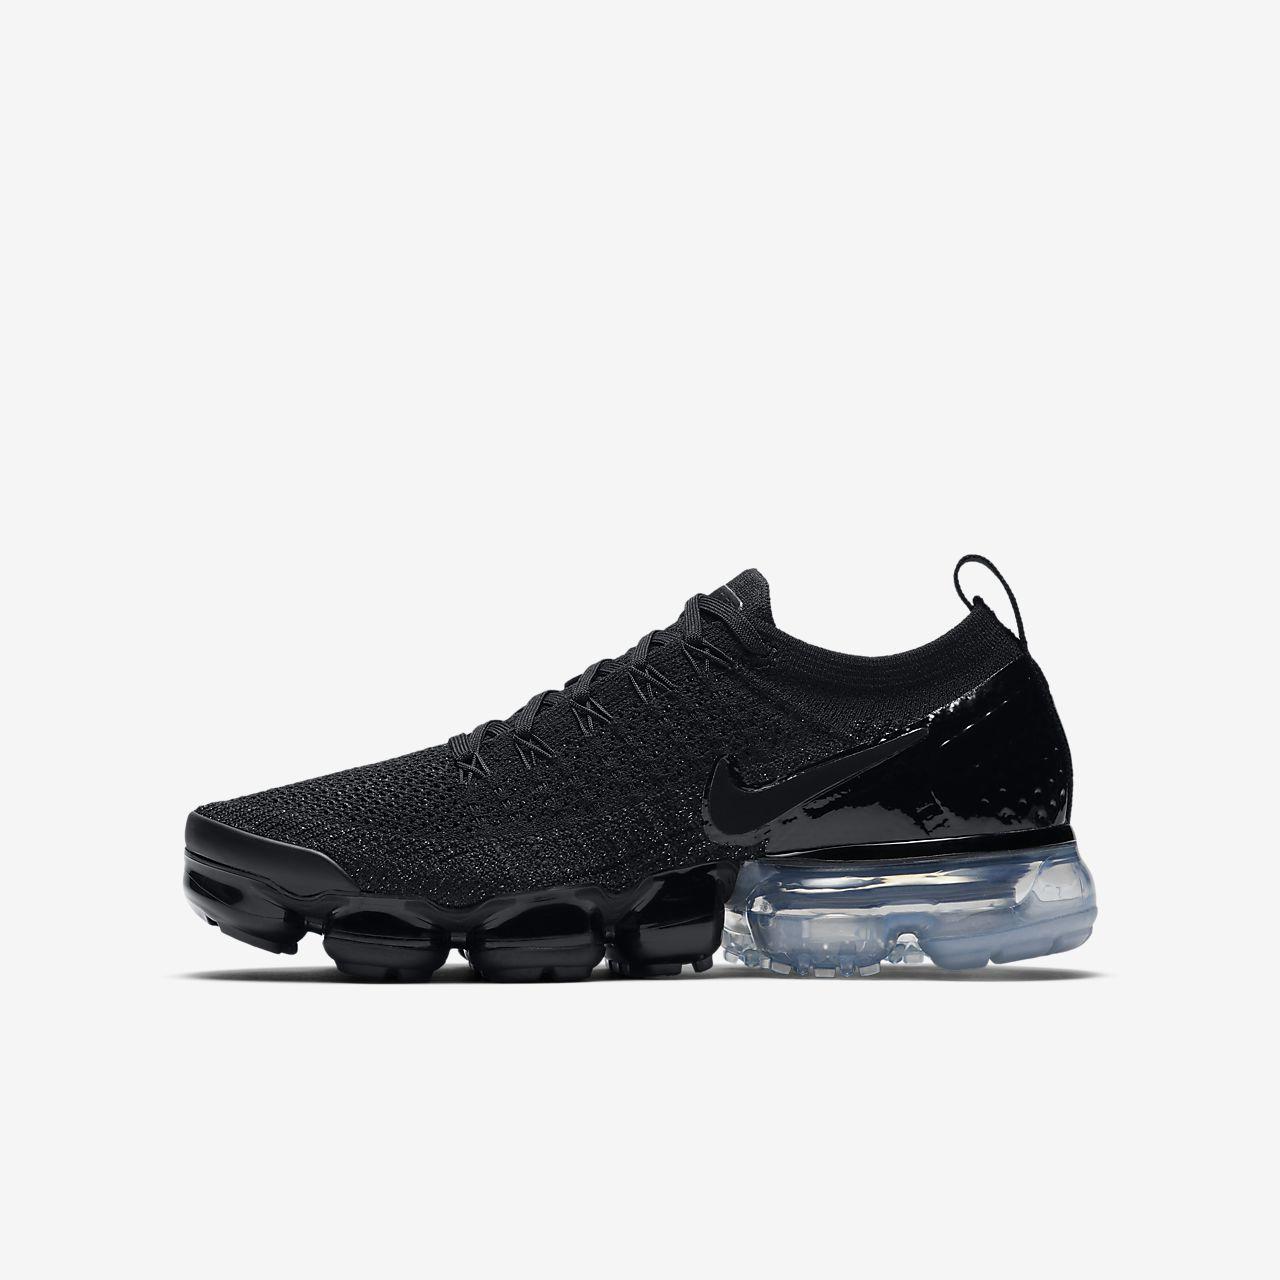 92f35a49cd4 ... official store calzado para mujer nike air vapormax flyknit 2 f772a  bde47